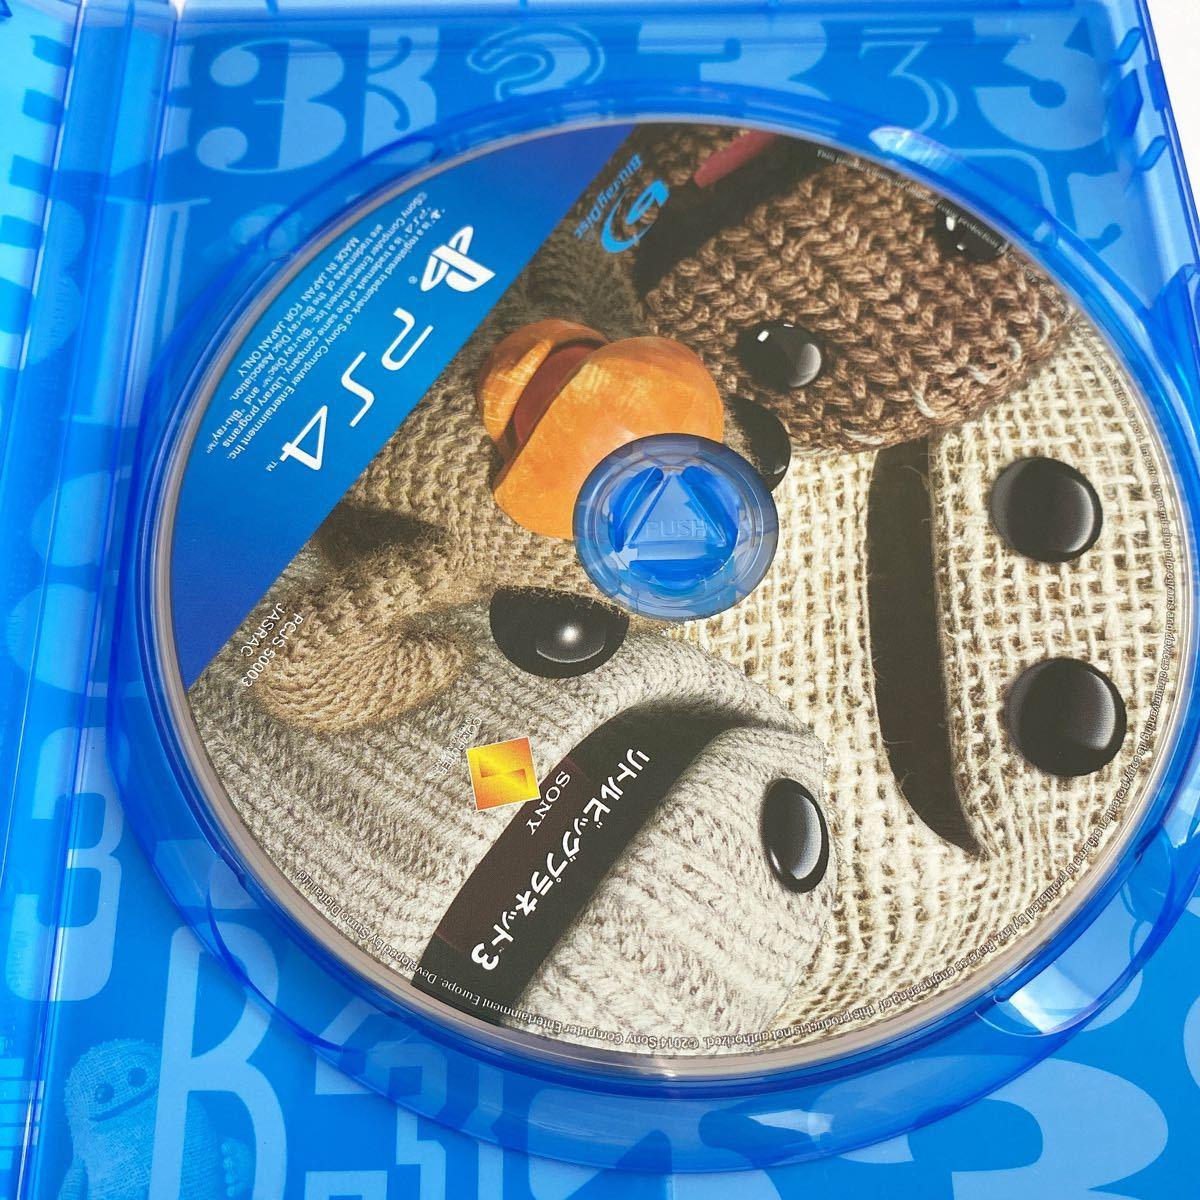 PS4 ソフト リトルビッグプラネット3